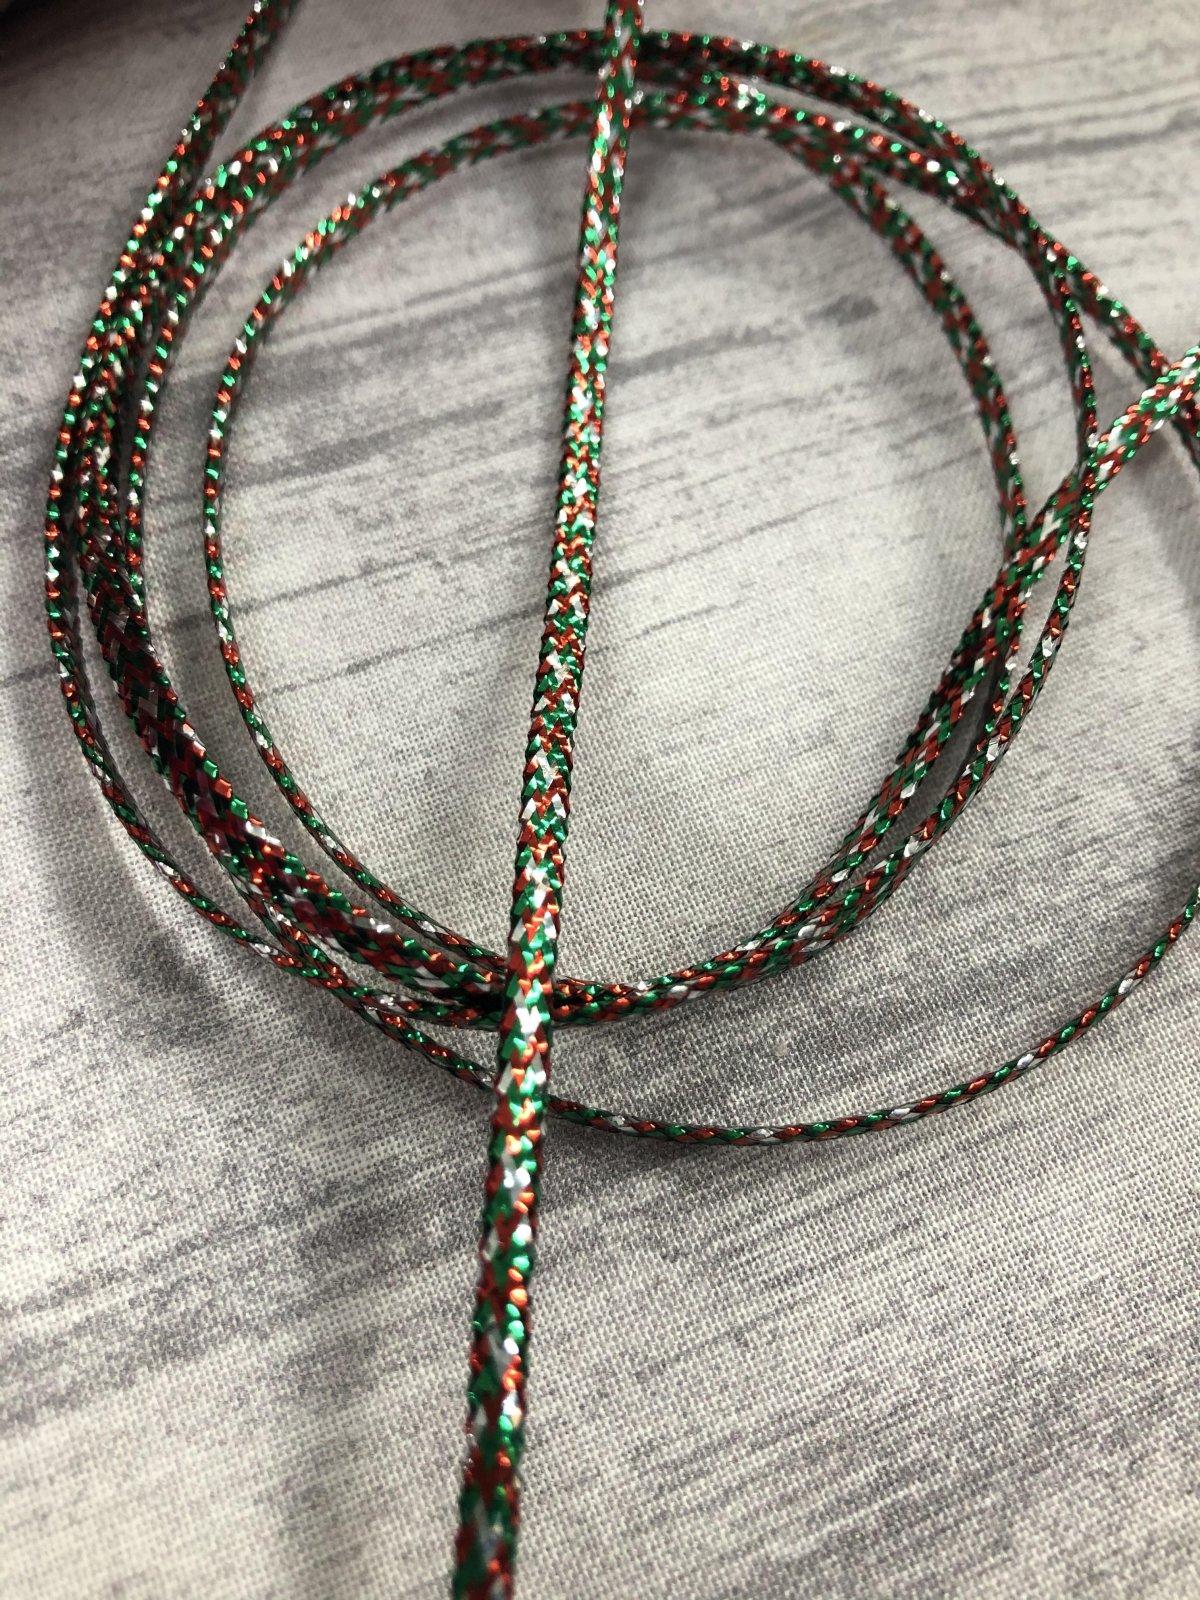 3mm Flat Cording Metallic Red Green Silver 69%Metallic/31%Nylon